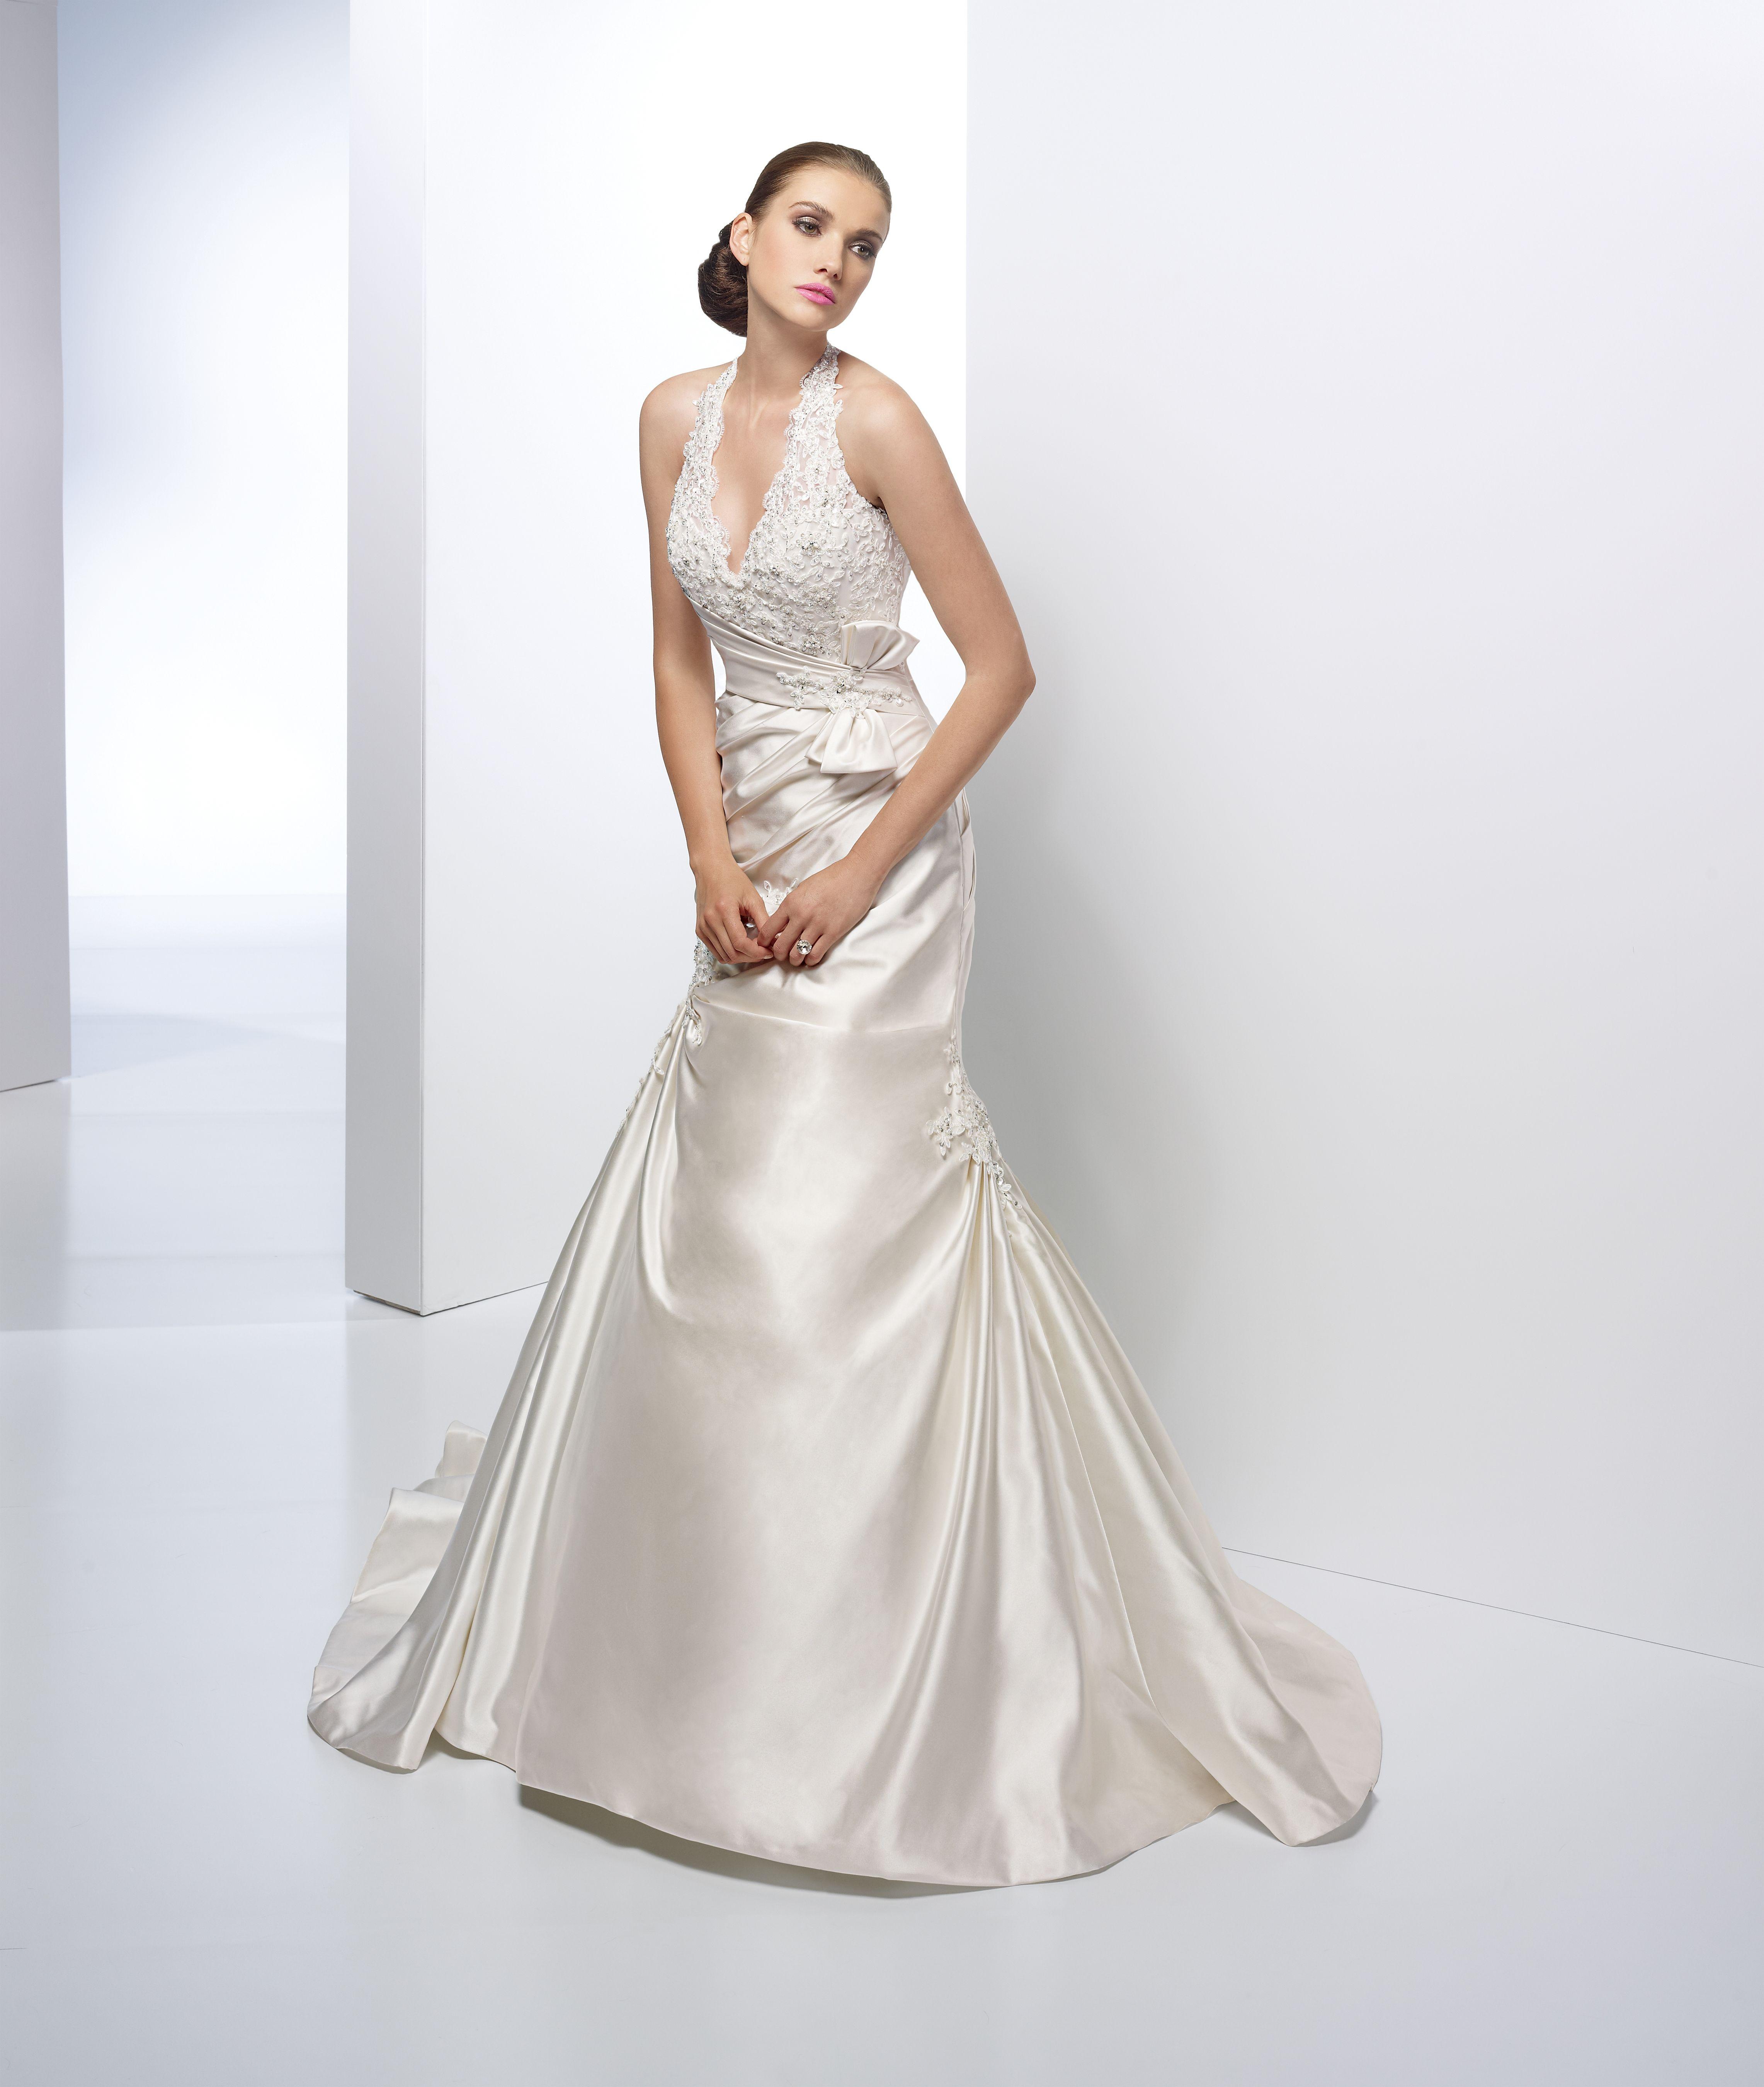 Lace wedding dress under 300  Aurora Bridal PA  Lace u Vintage Collection  Pinterest